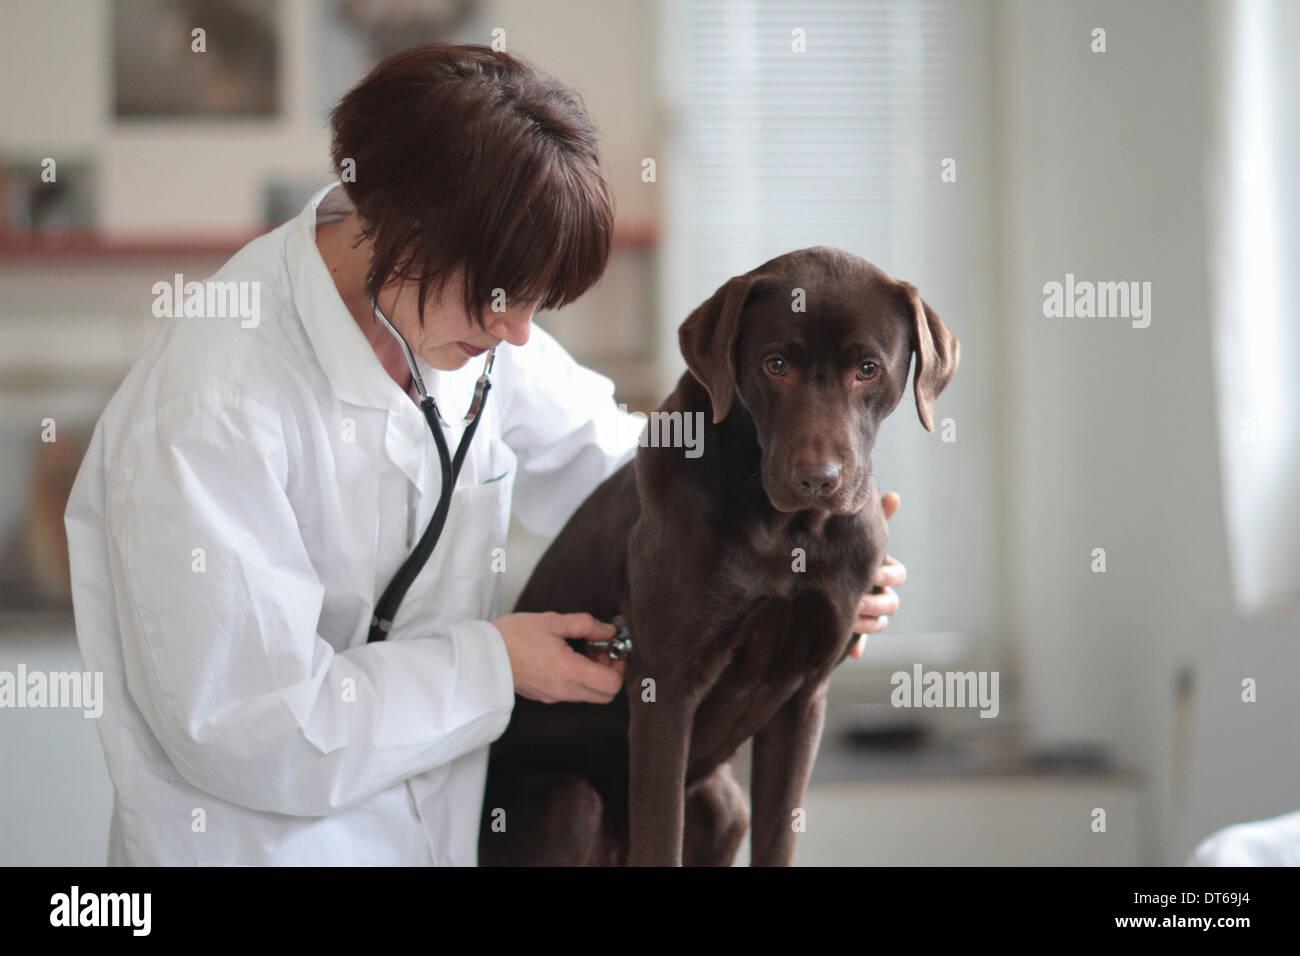 Female veterinarian listening to dogs chest through stethoscope - Stock Image